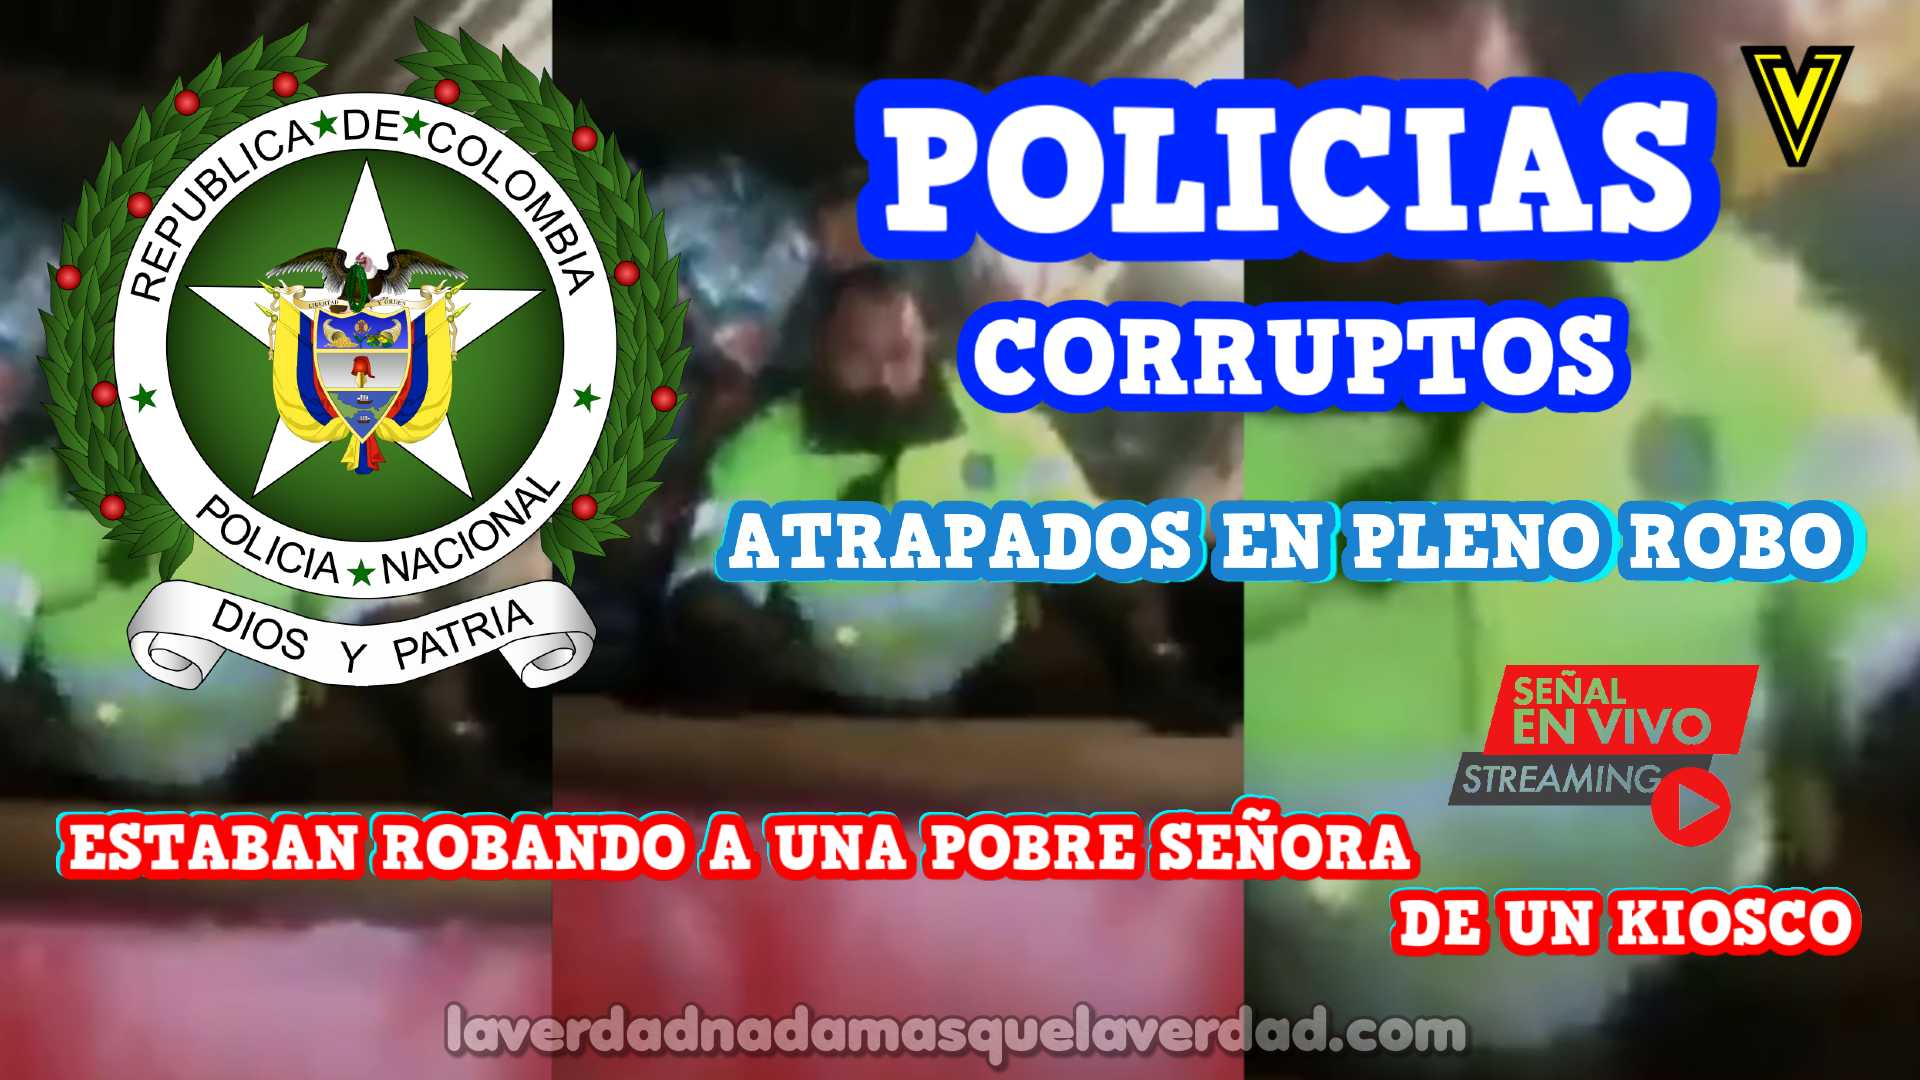 POLICIAS CORRUPTOS